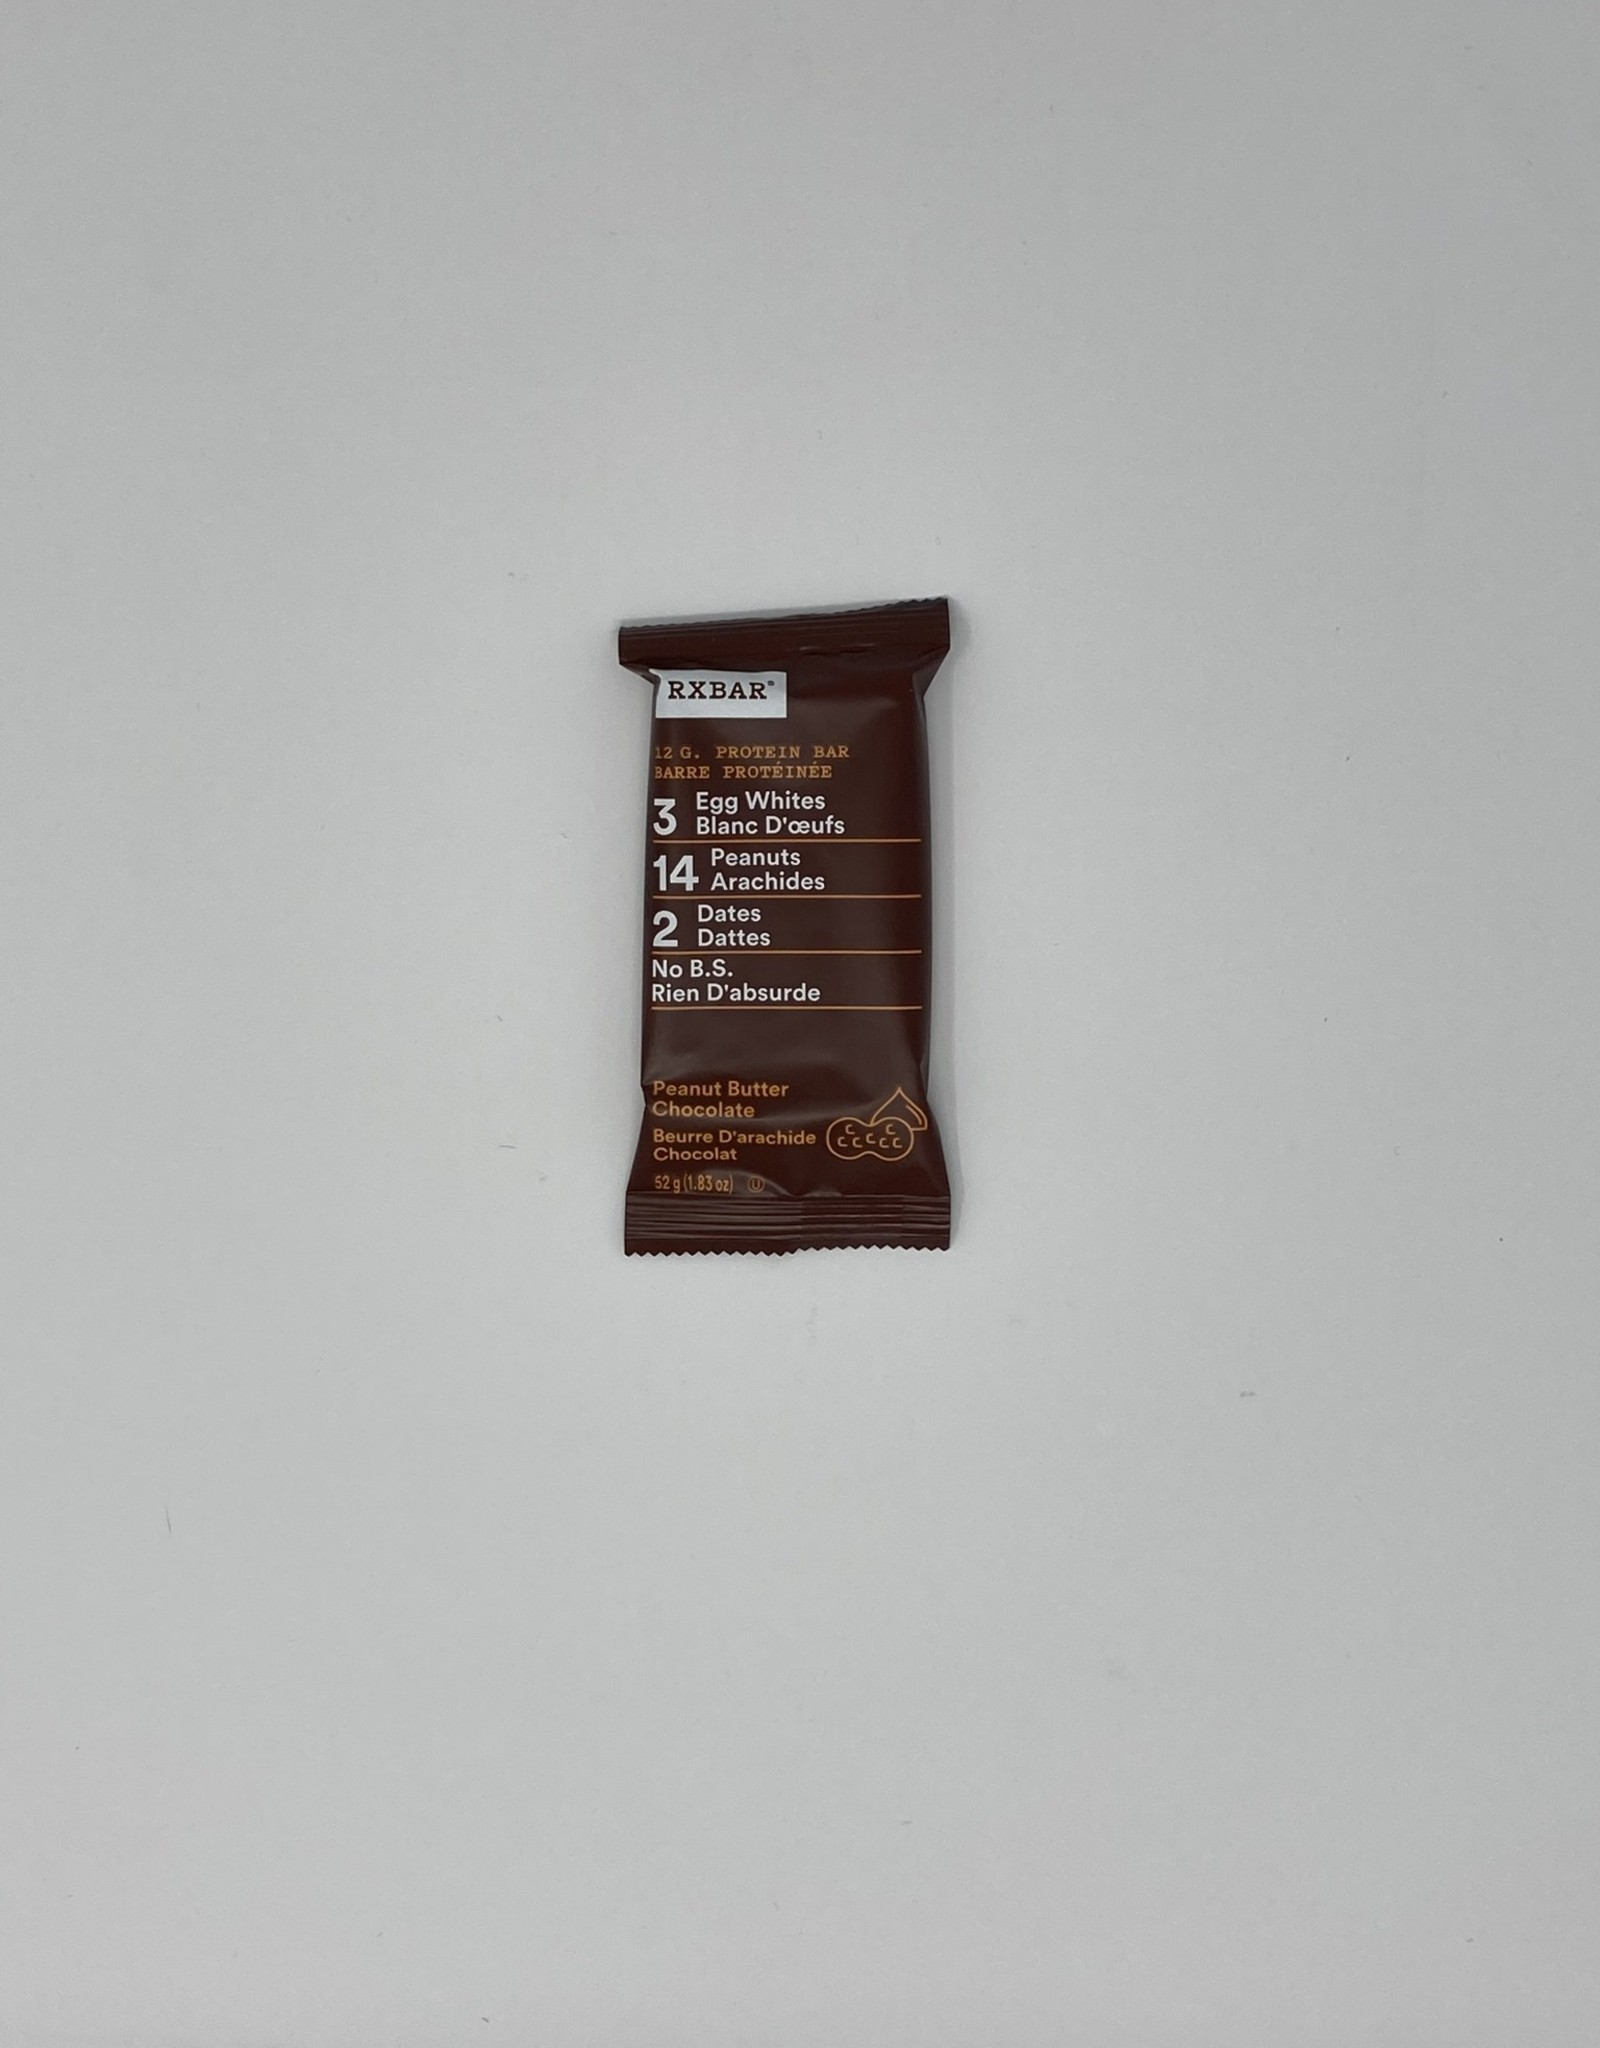 RX Bar RX Bar - Peanut Butter Chocolate